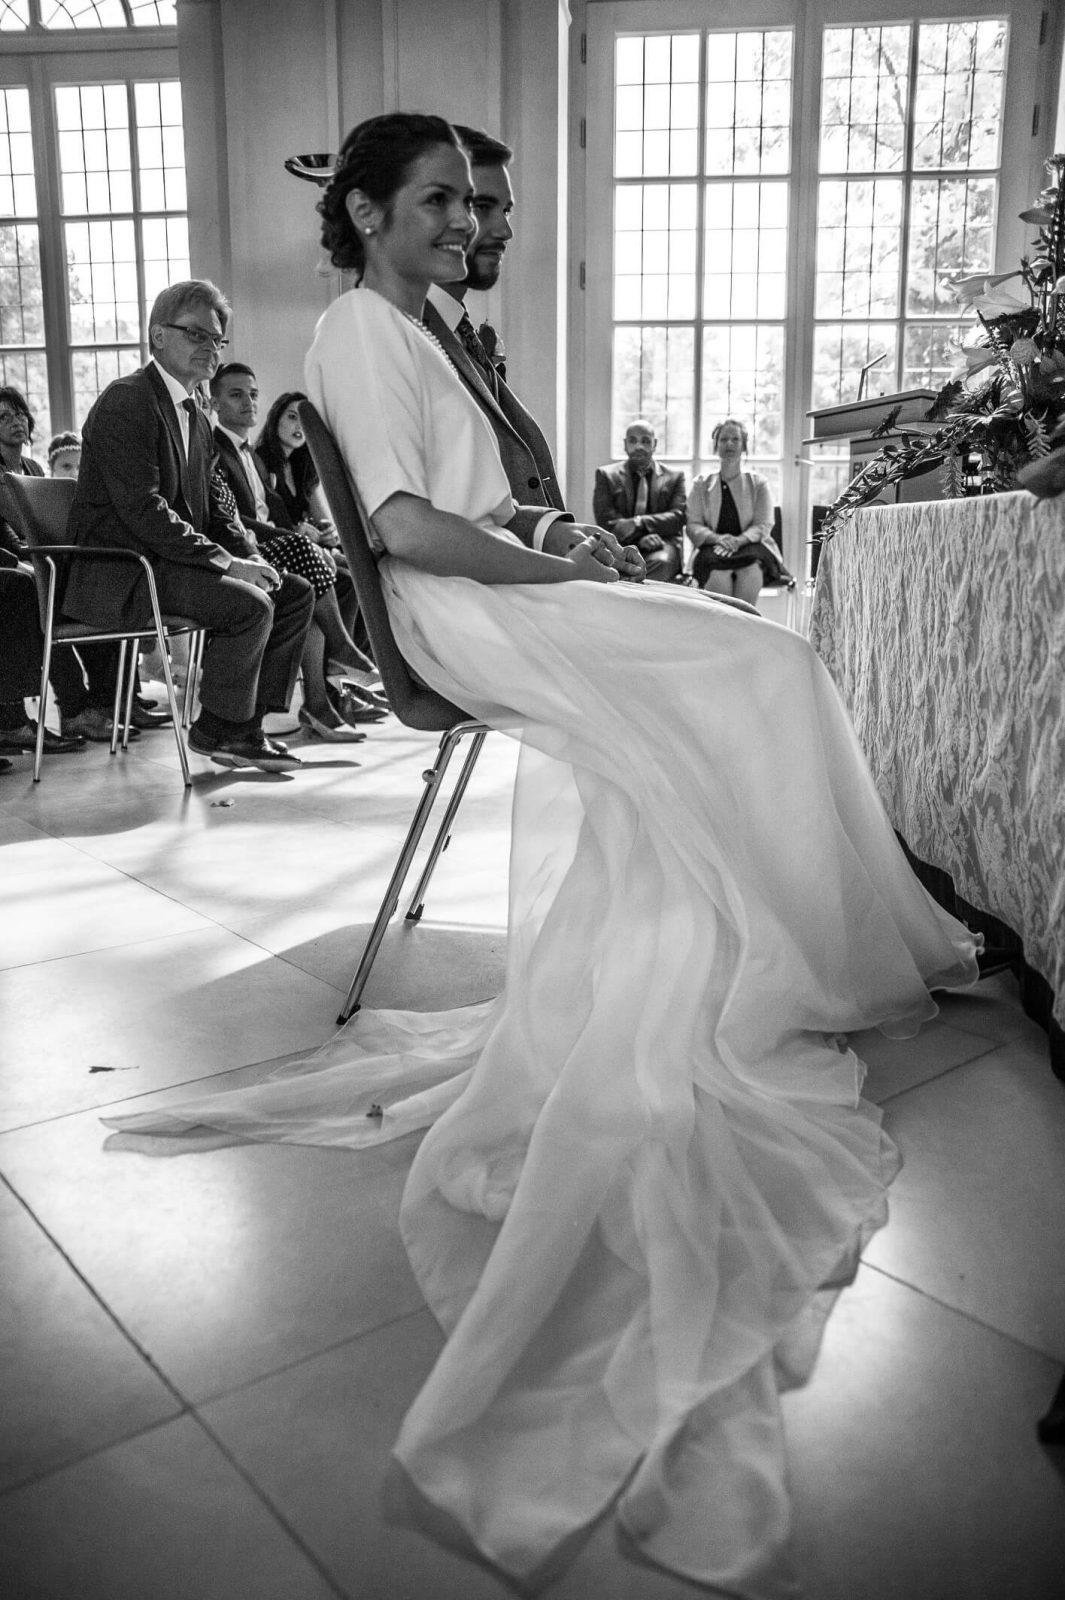 Long flowing organza wedding skirt